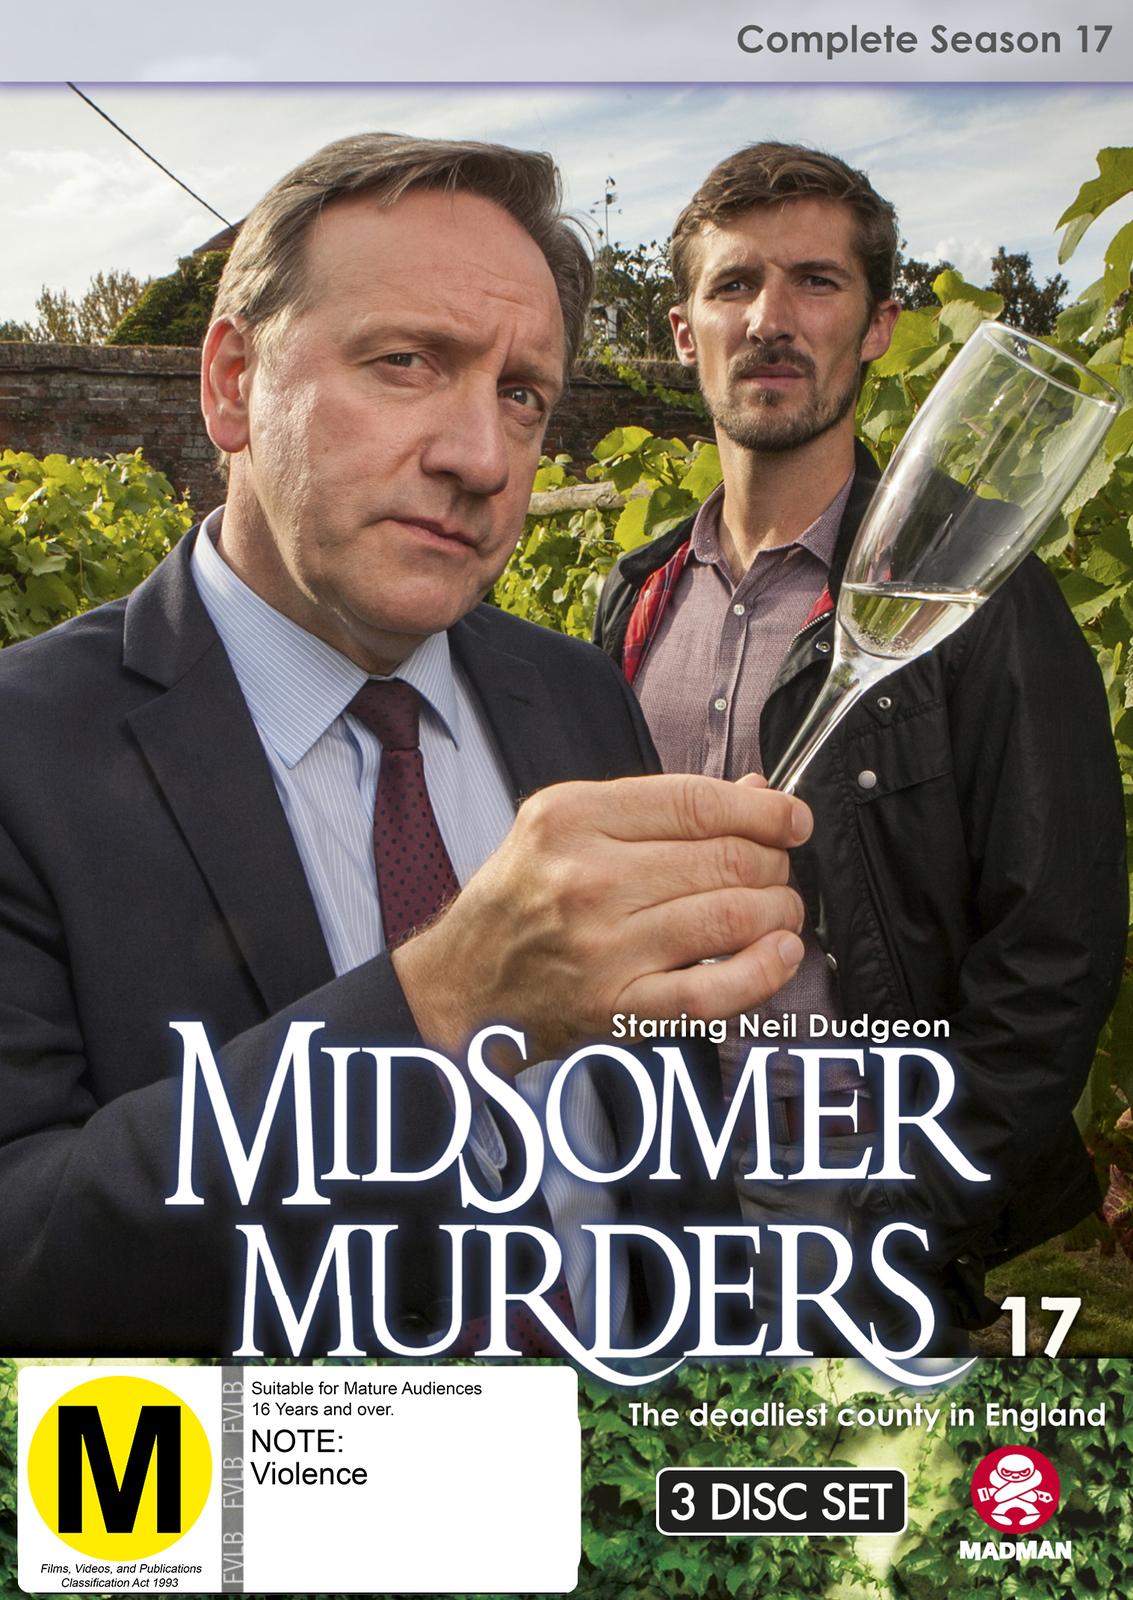 Midsomer Murders - Complete Season 17 on DVD image